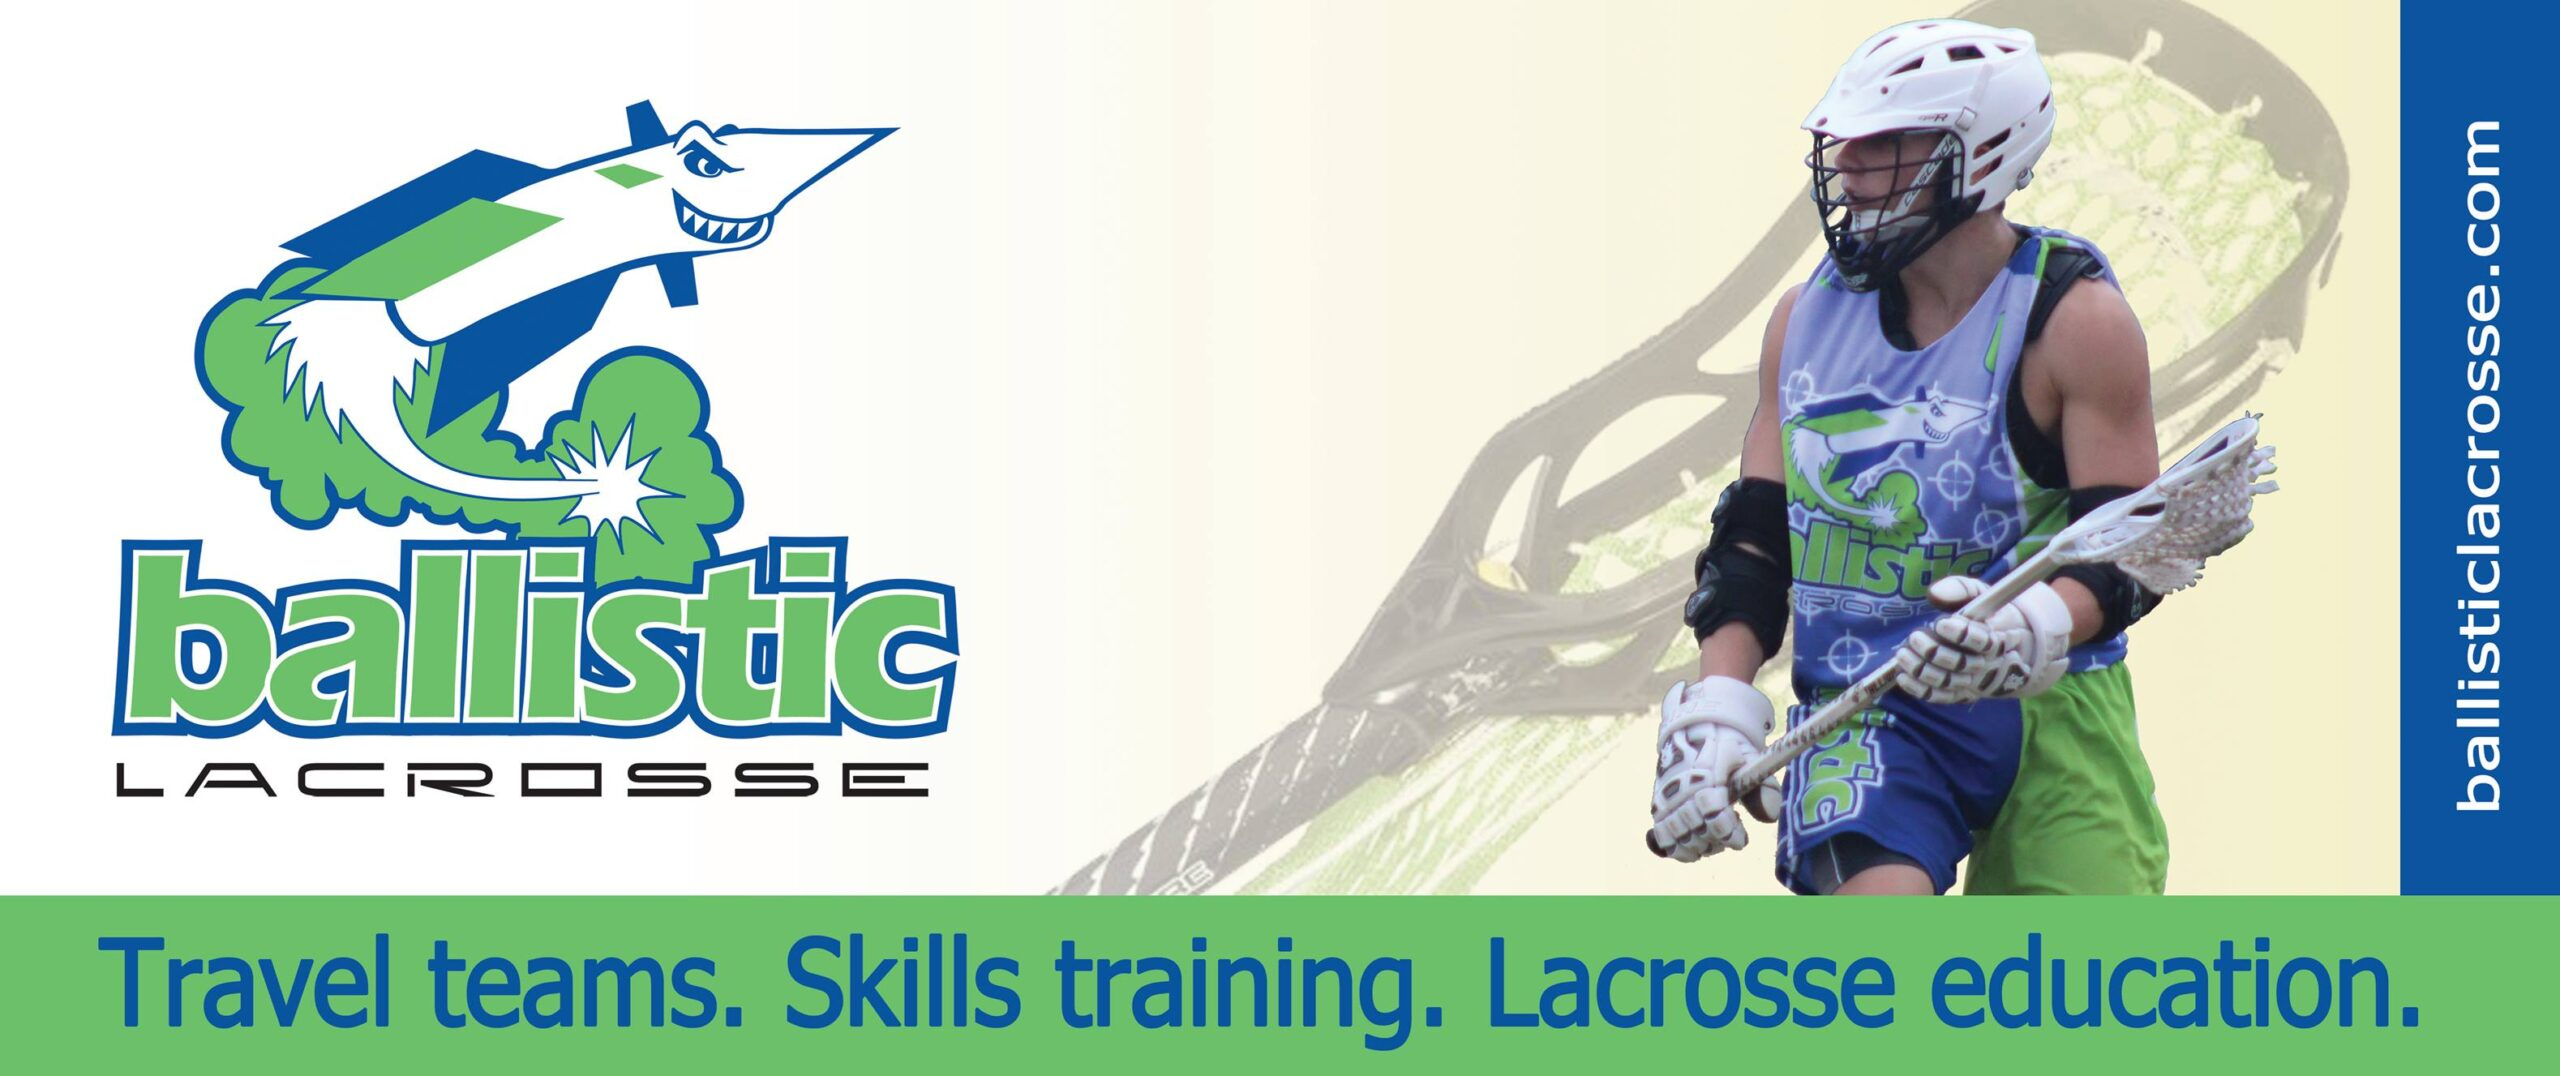 Ballistic Lacrosse banner ad